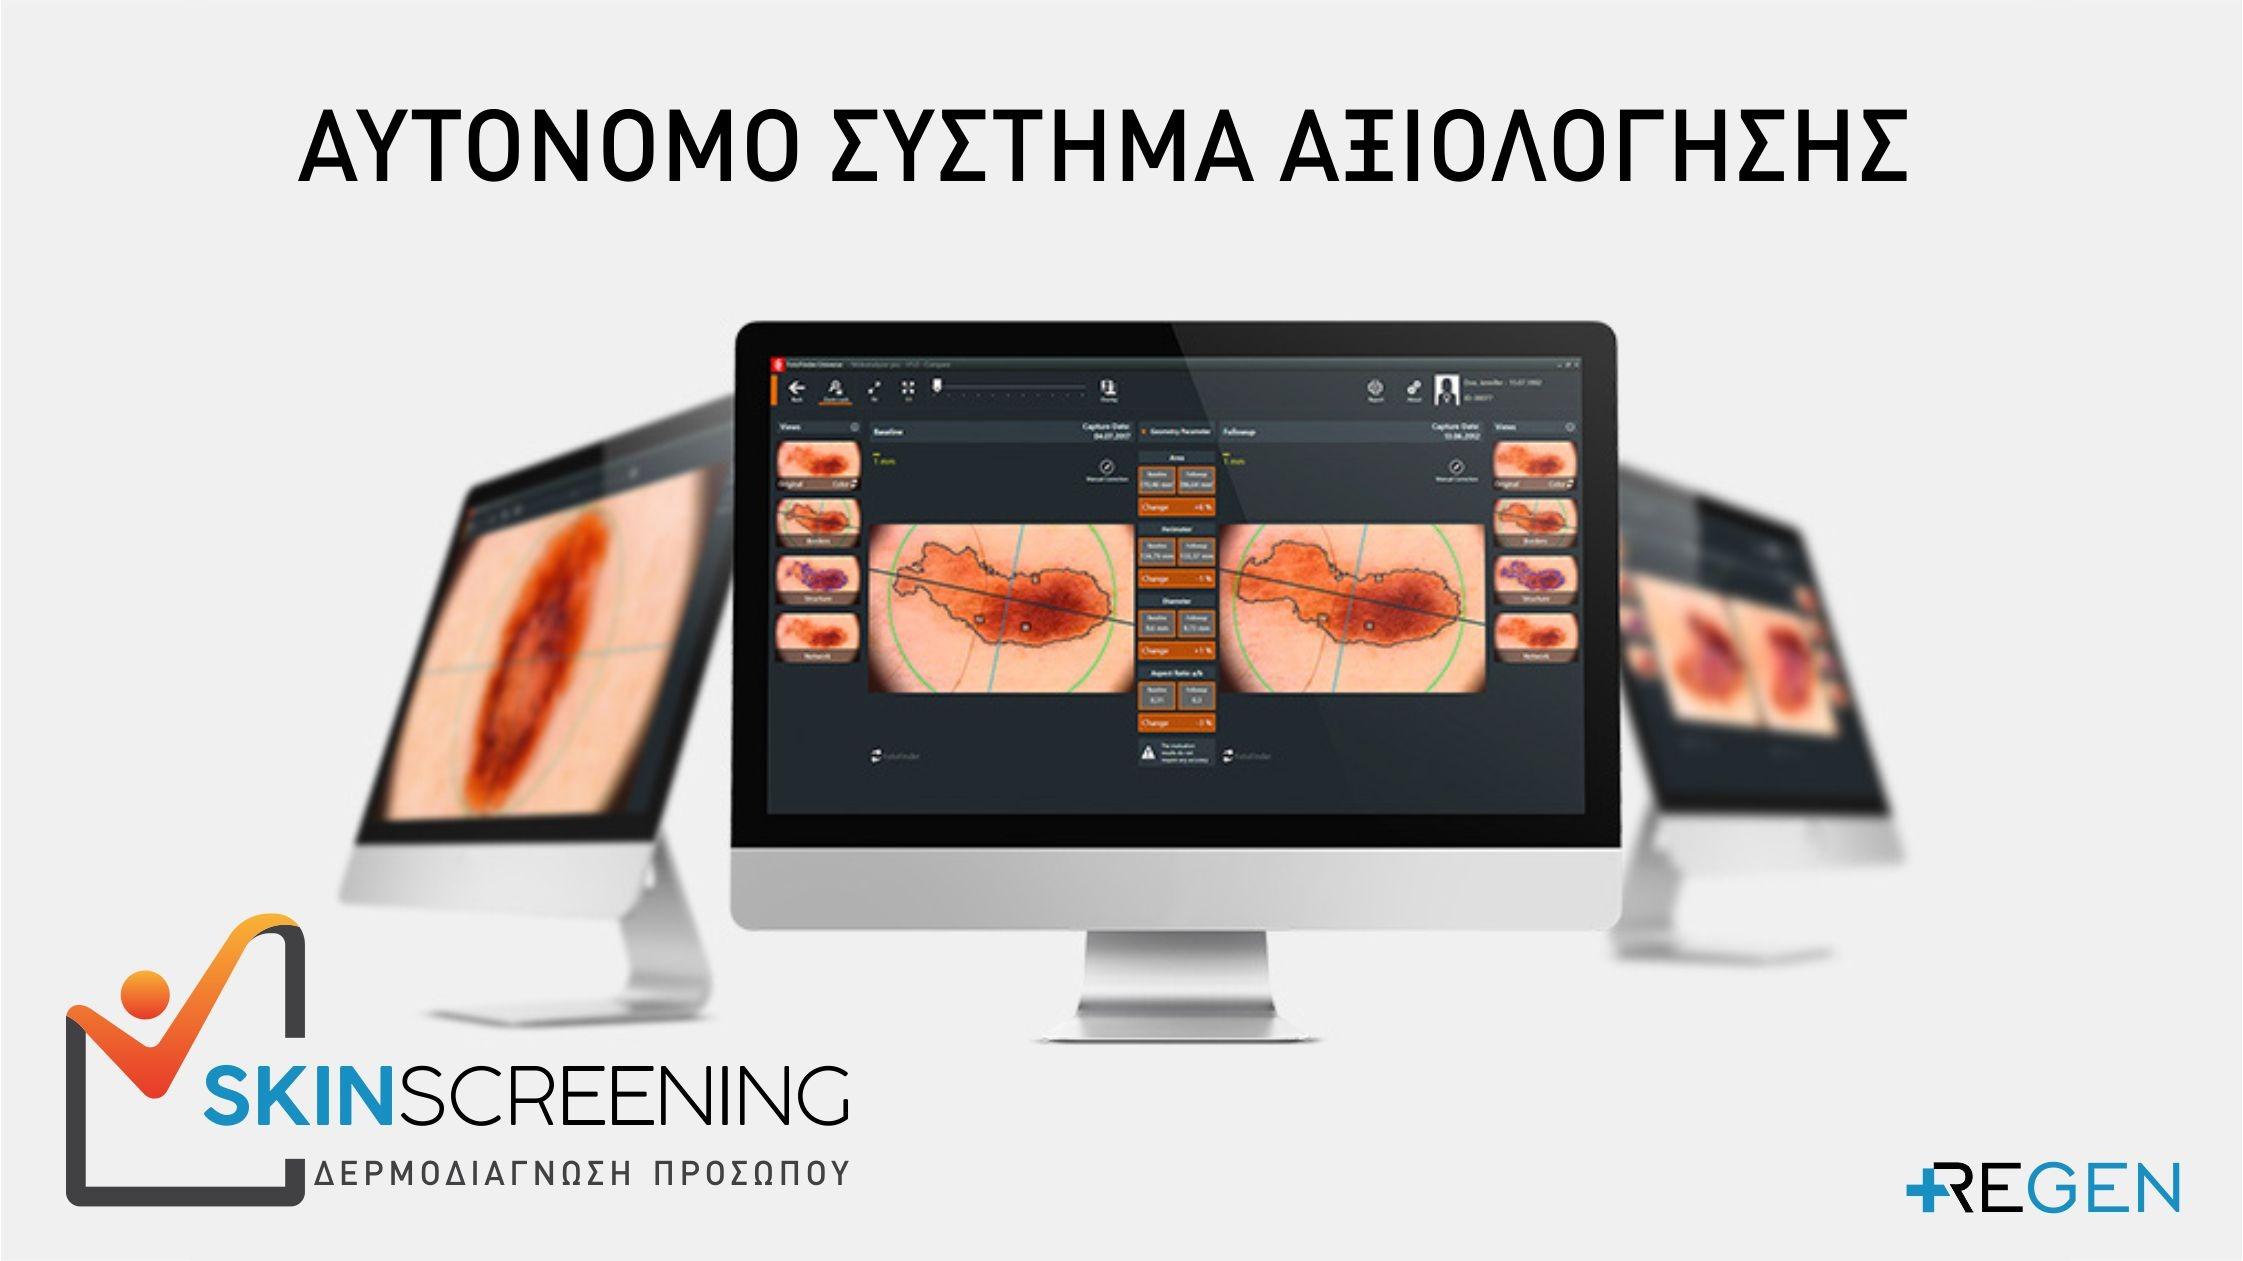 Skin Screening card07